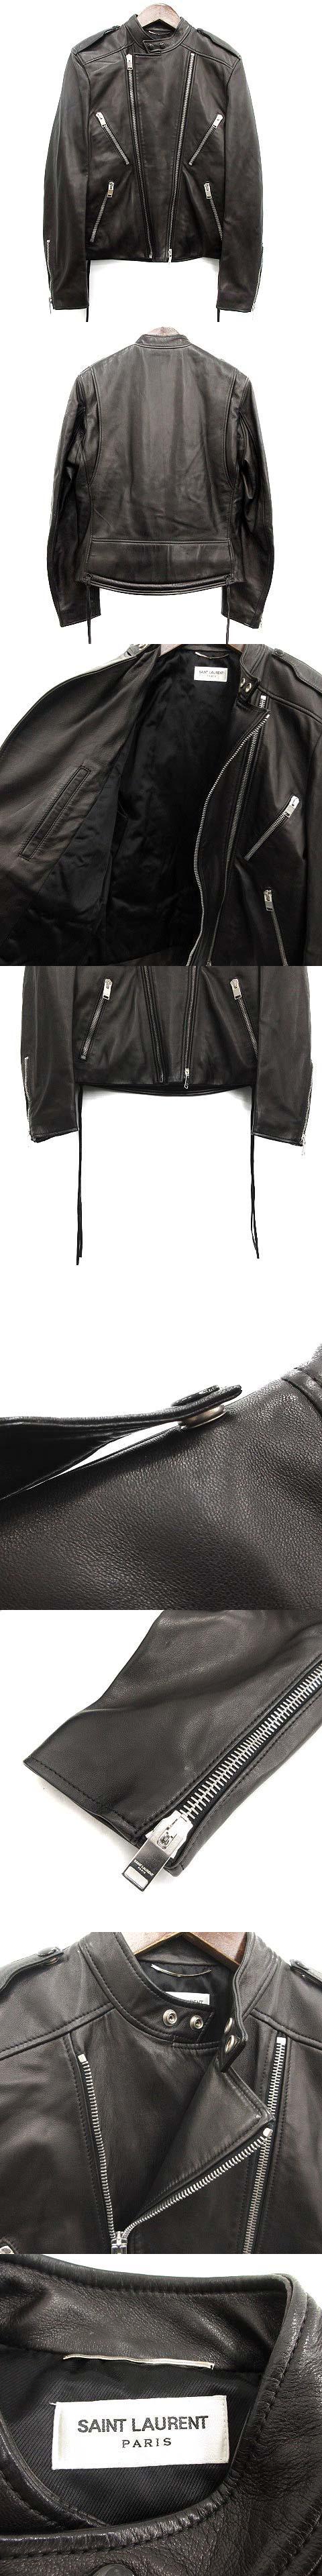 13SS ライダースジャケット ラムレザー 黒 ブラック 320985 /TU